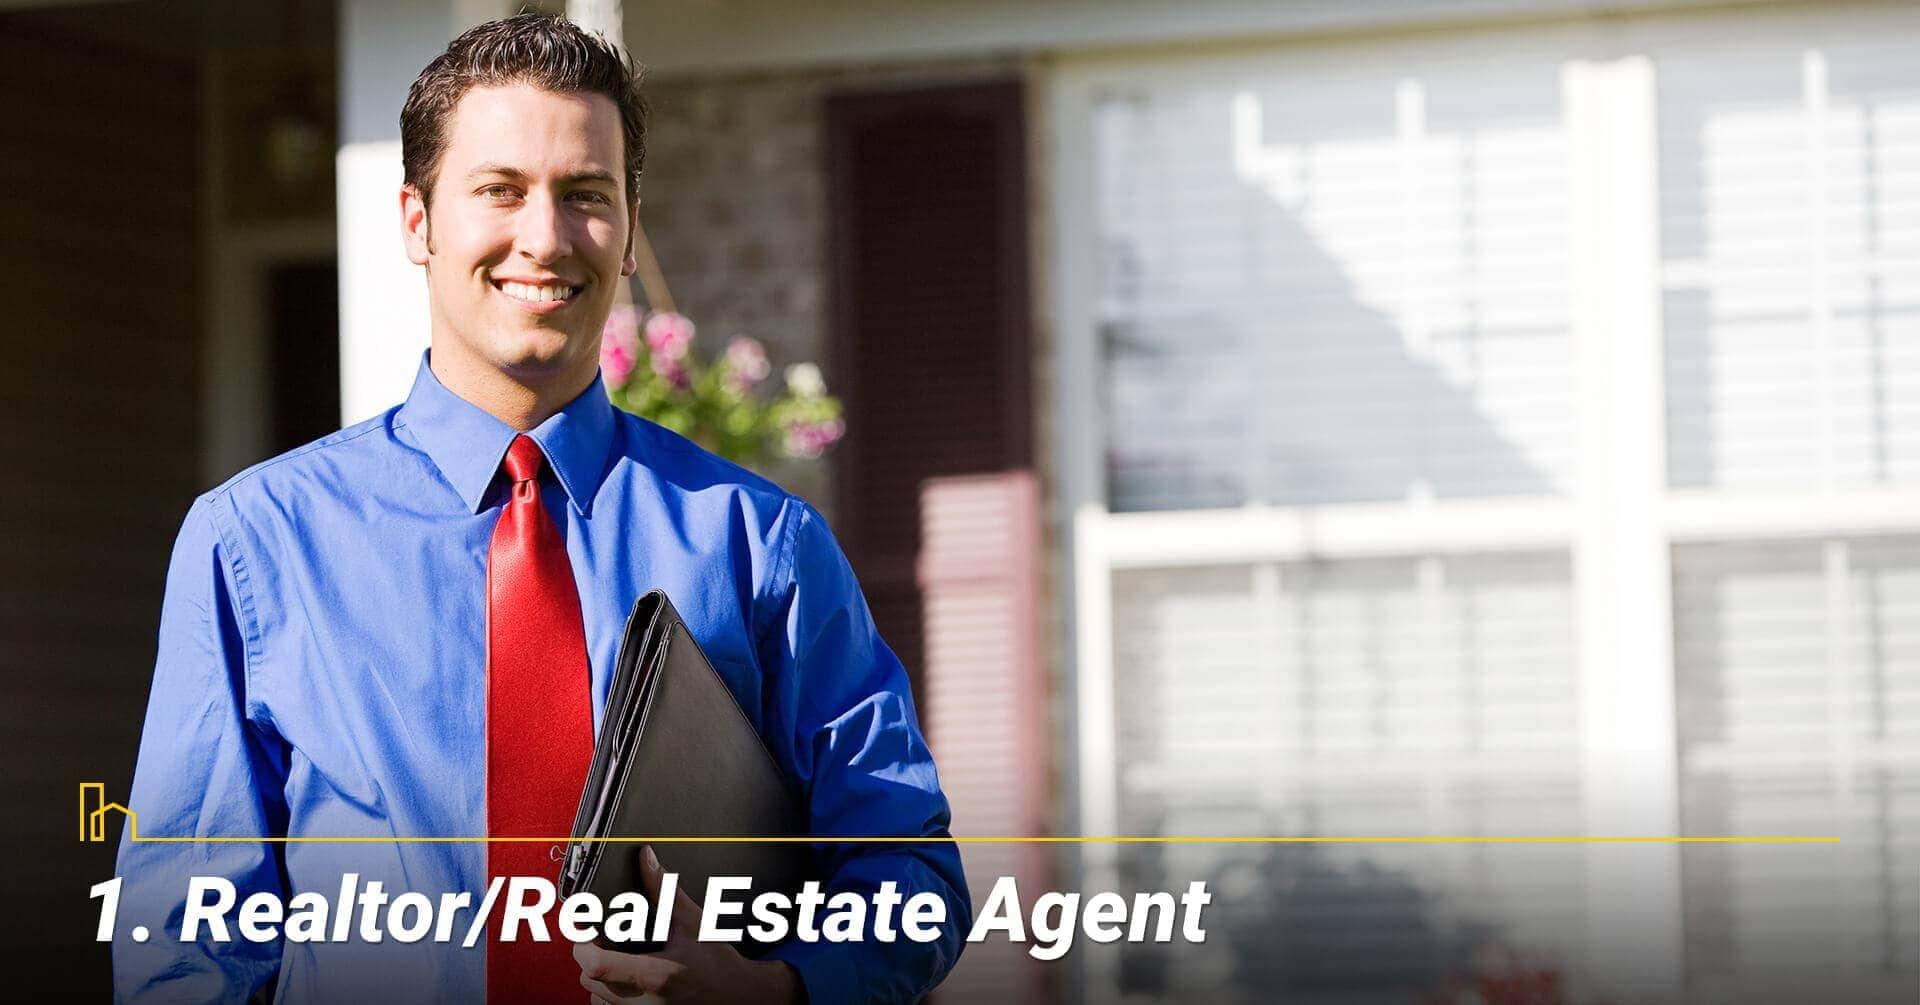 Realtor/Real Estate Agent